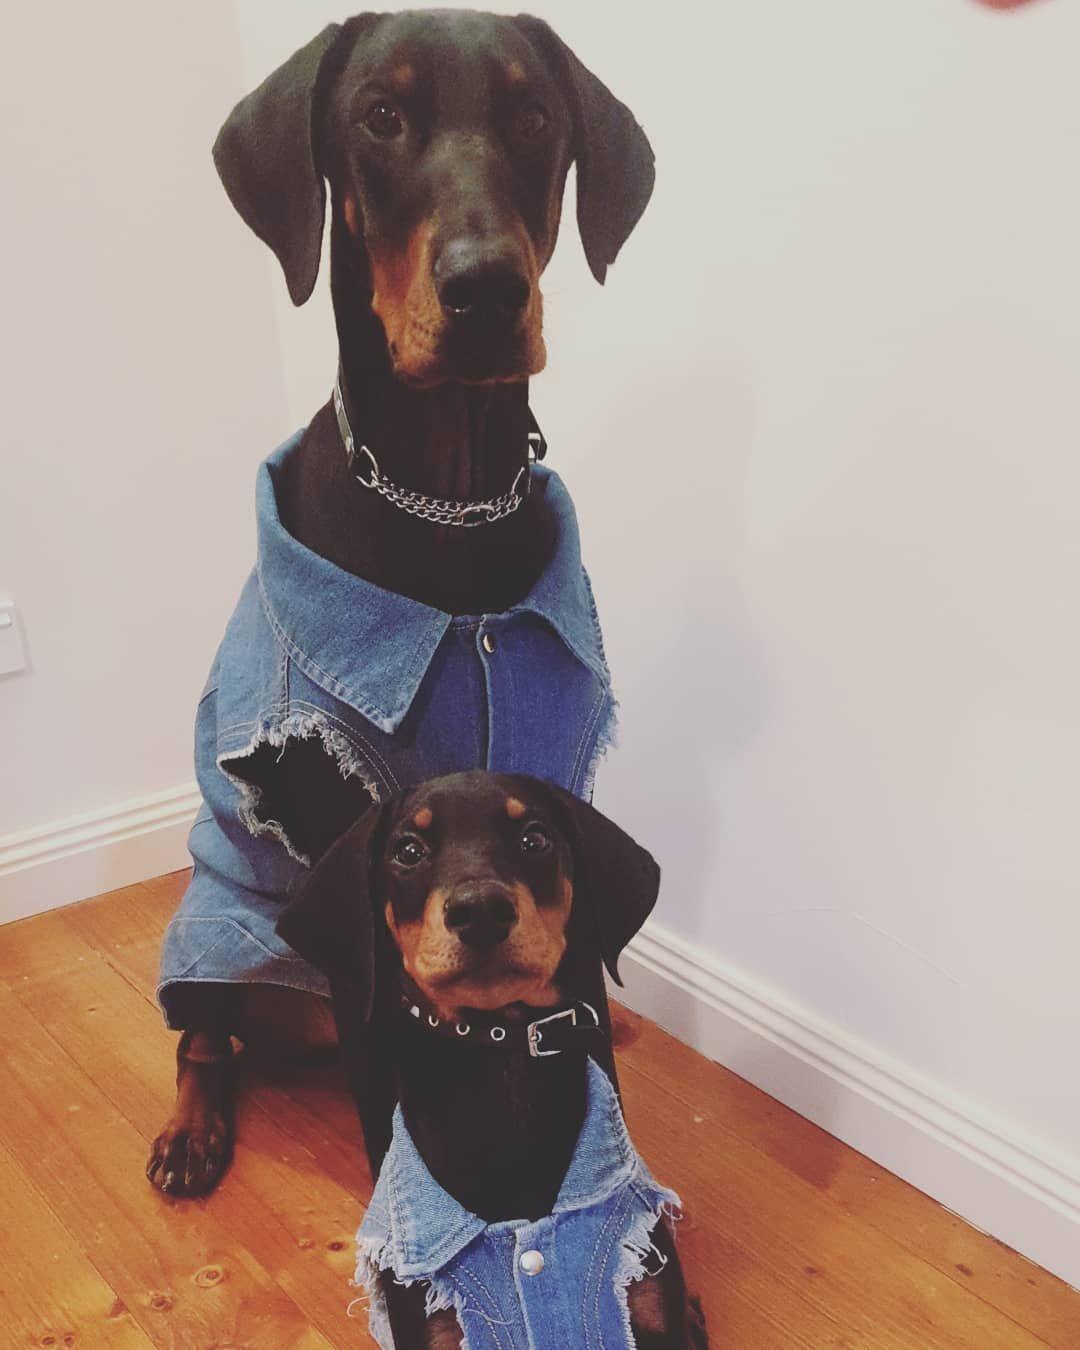 #doberman #dobermanpinscher #dog #dogsofinstagram #dogs #dobie #dobermansofinstagram #dobermanpride #dobermann #k #dobermandogs #puppy #dobermanpuppy #dobermanlove #dobermans